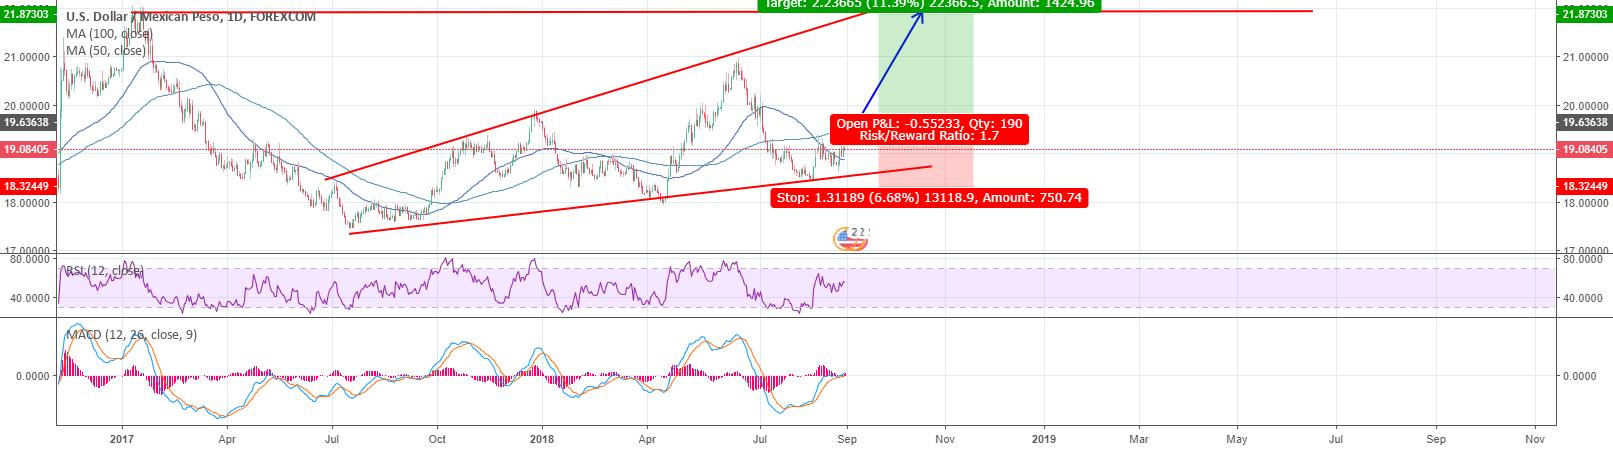 USD MXN Long Sherems Live Trading 5